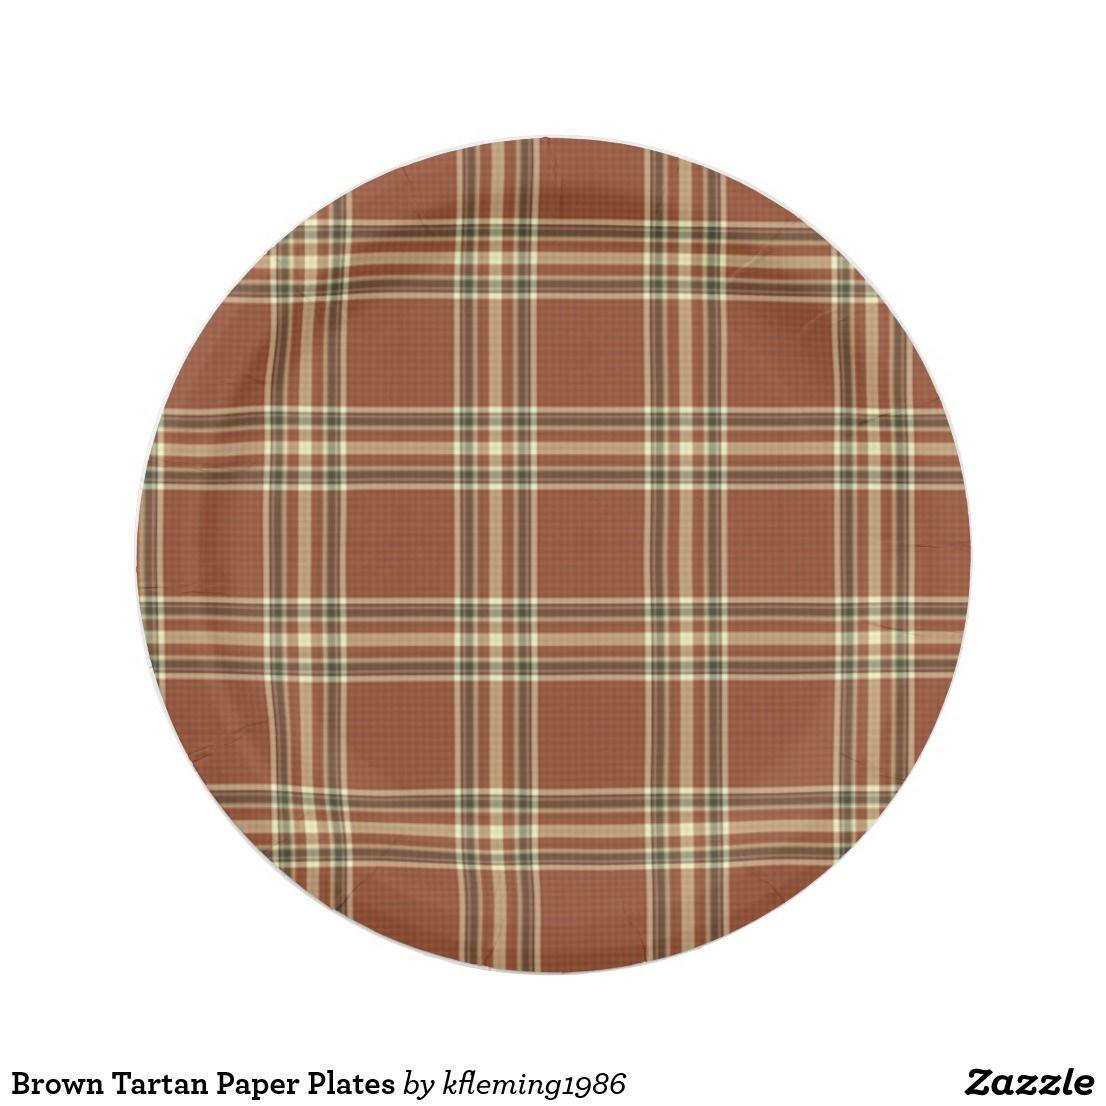 Brown Tartan Paper Plates  sc 1 st  Pinterest & Brown Tartan Paper Plates | Paper Plates | Pinterest